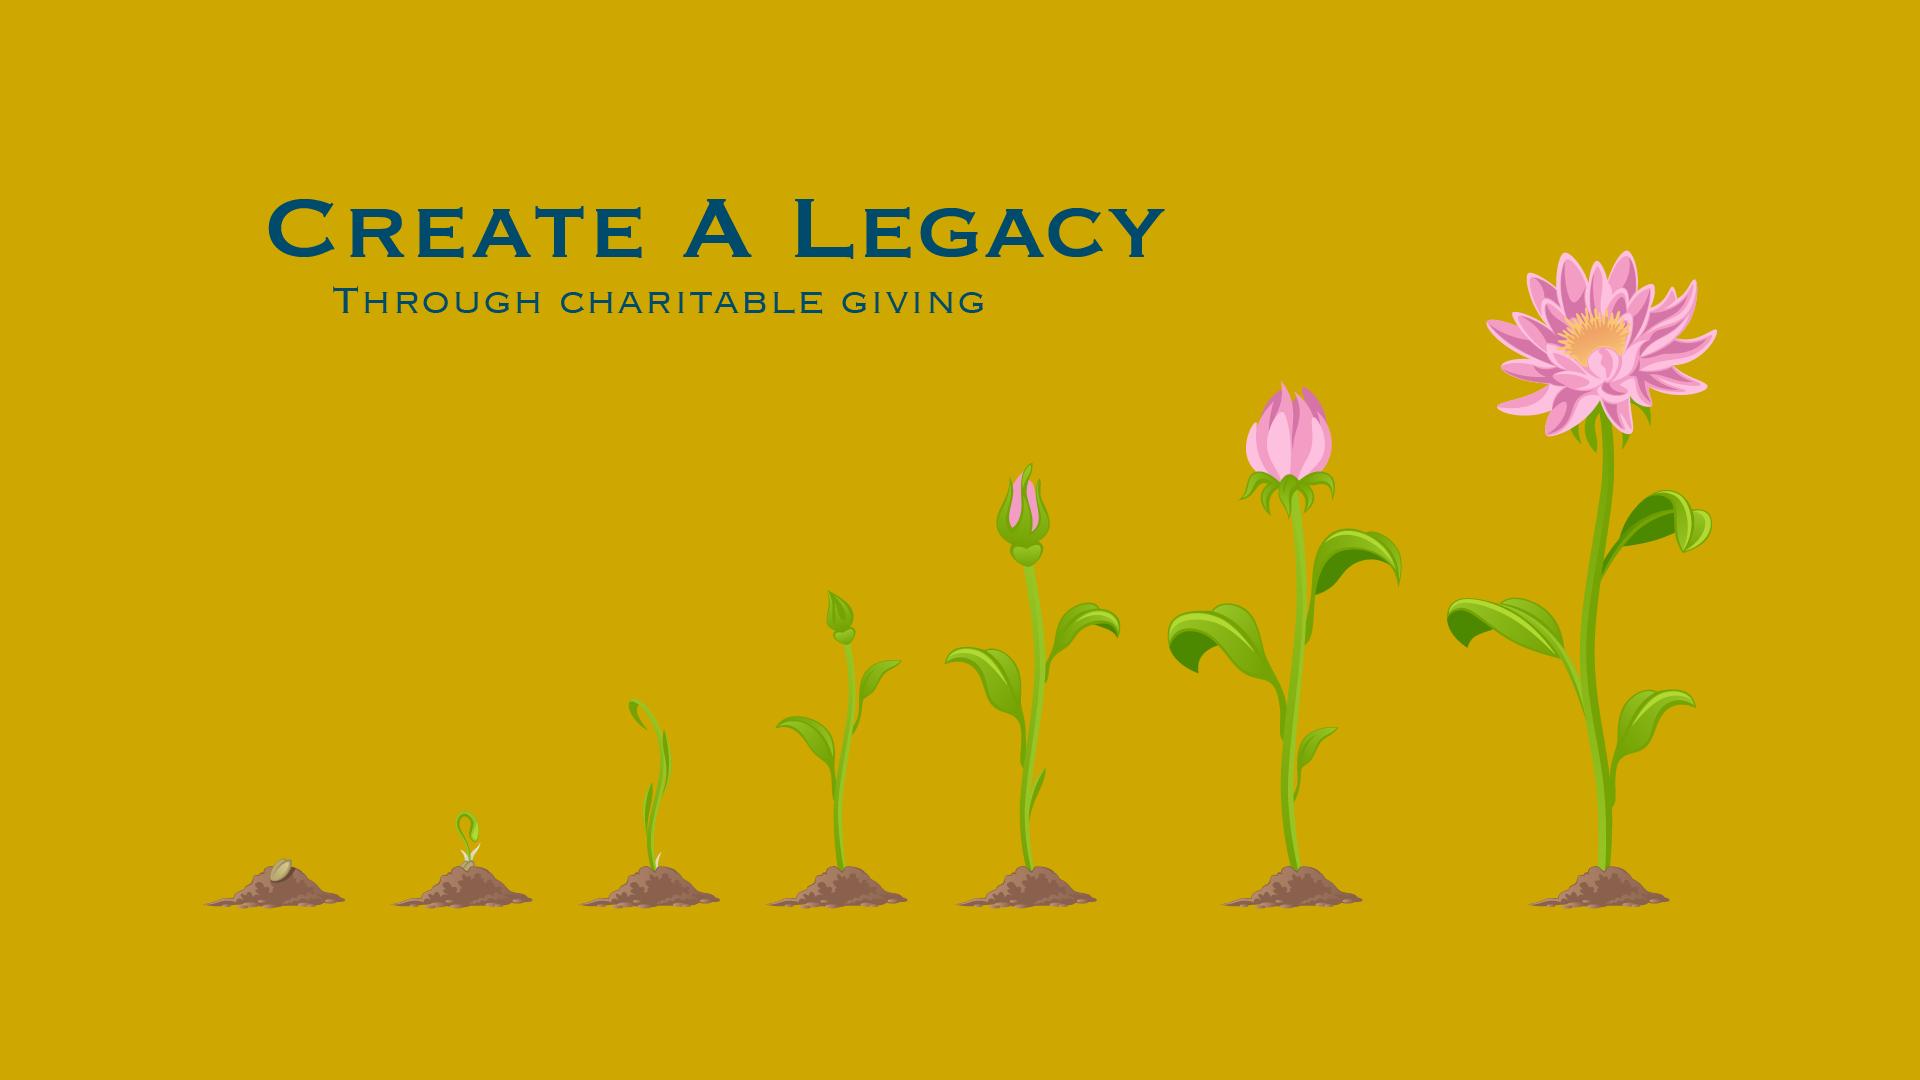 Create A Legacy Through Charitable Giving